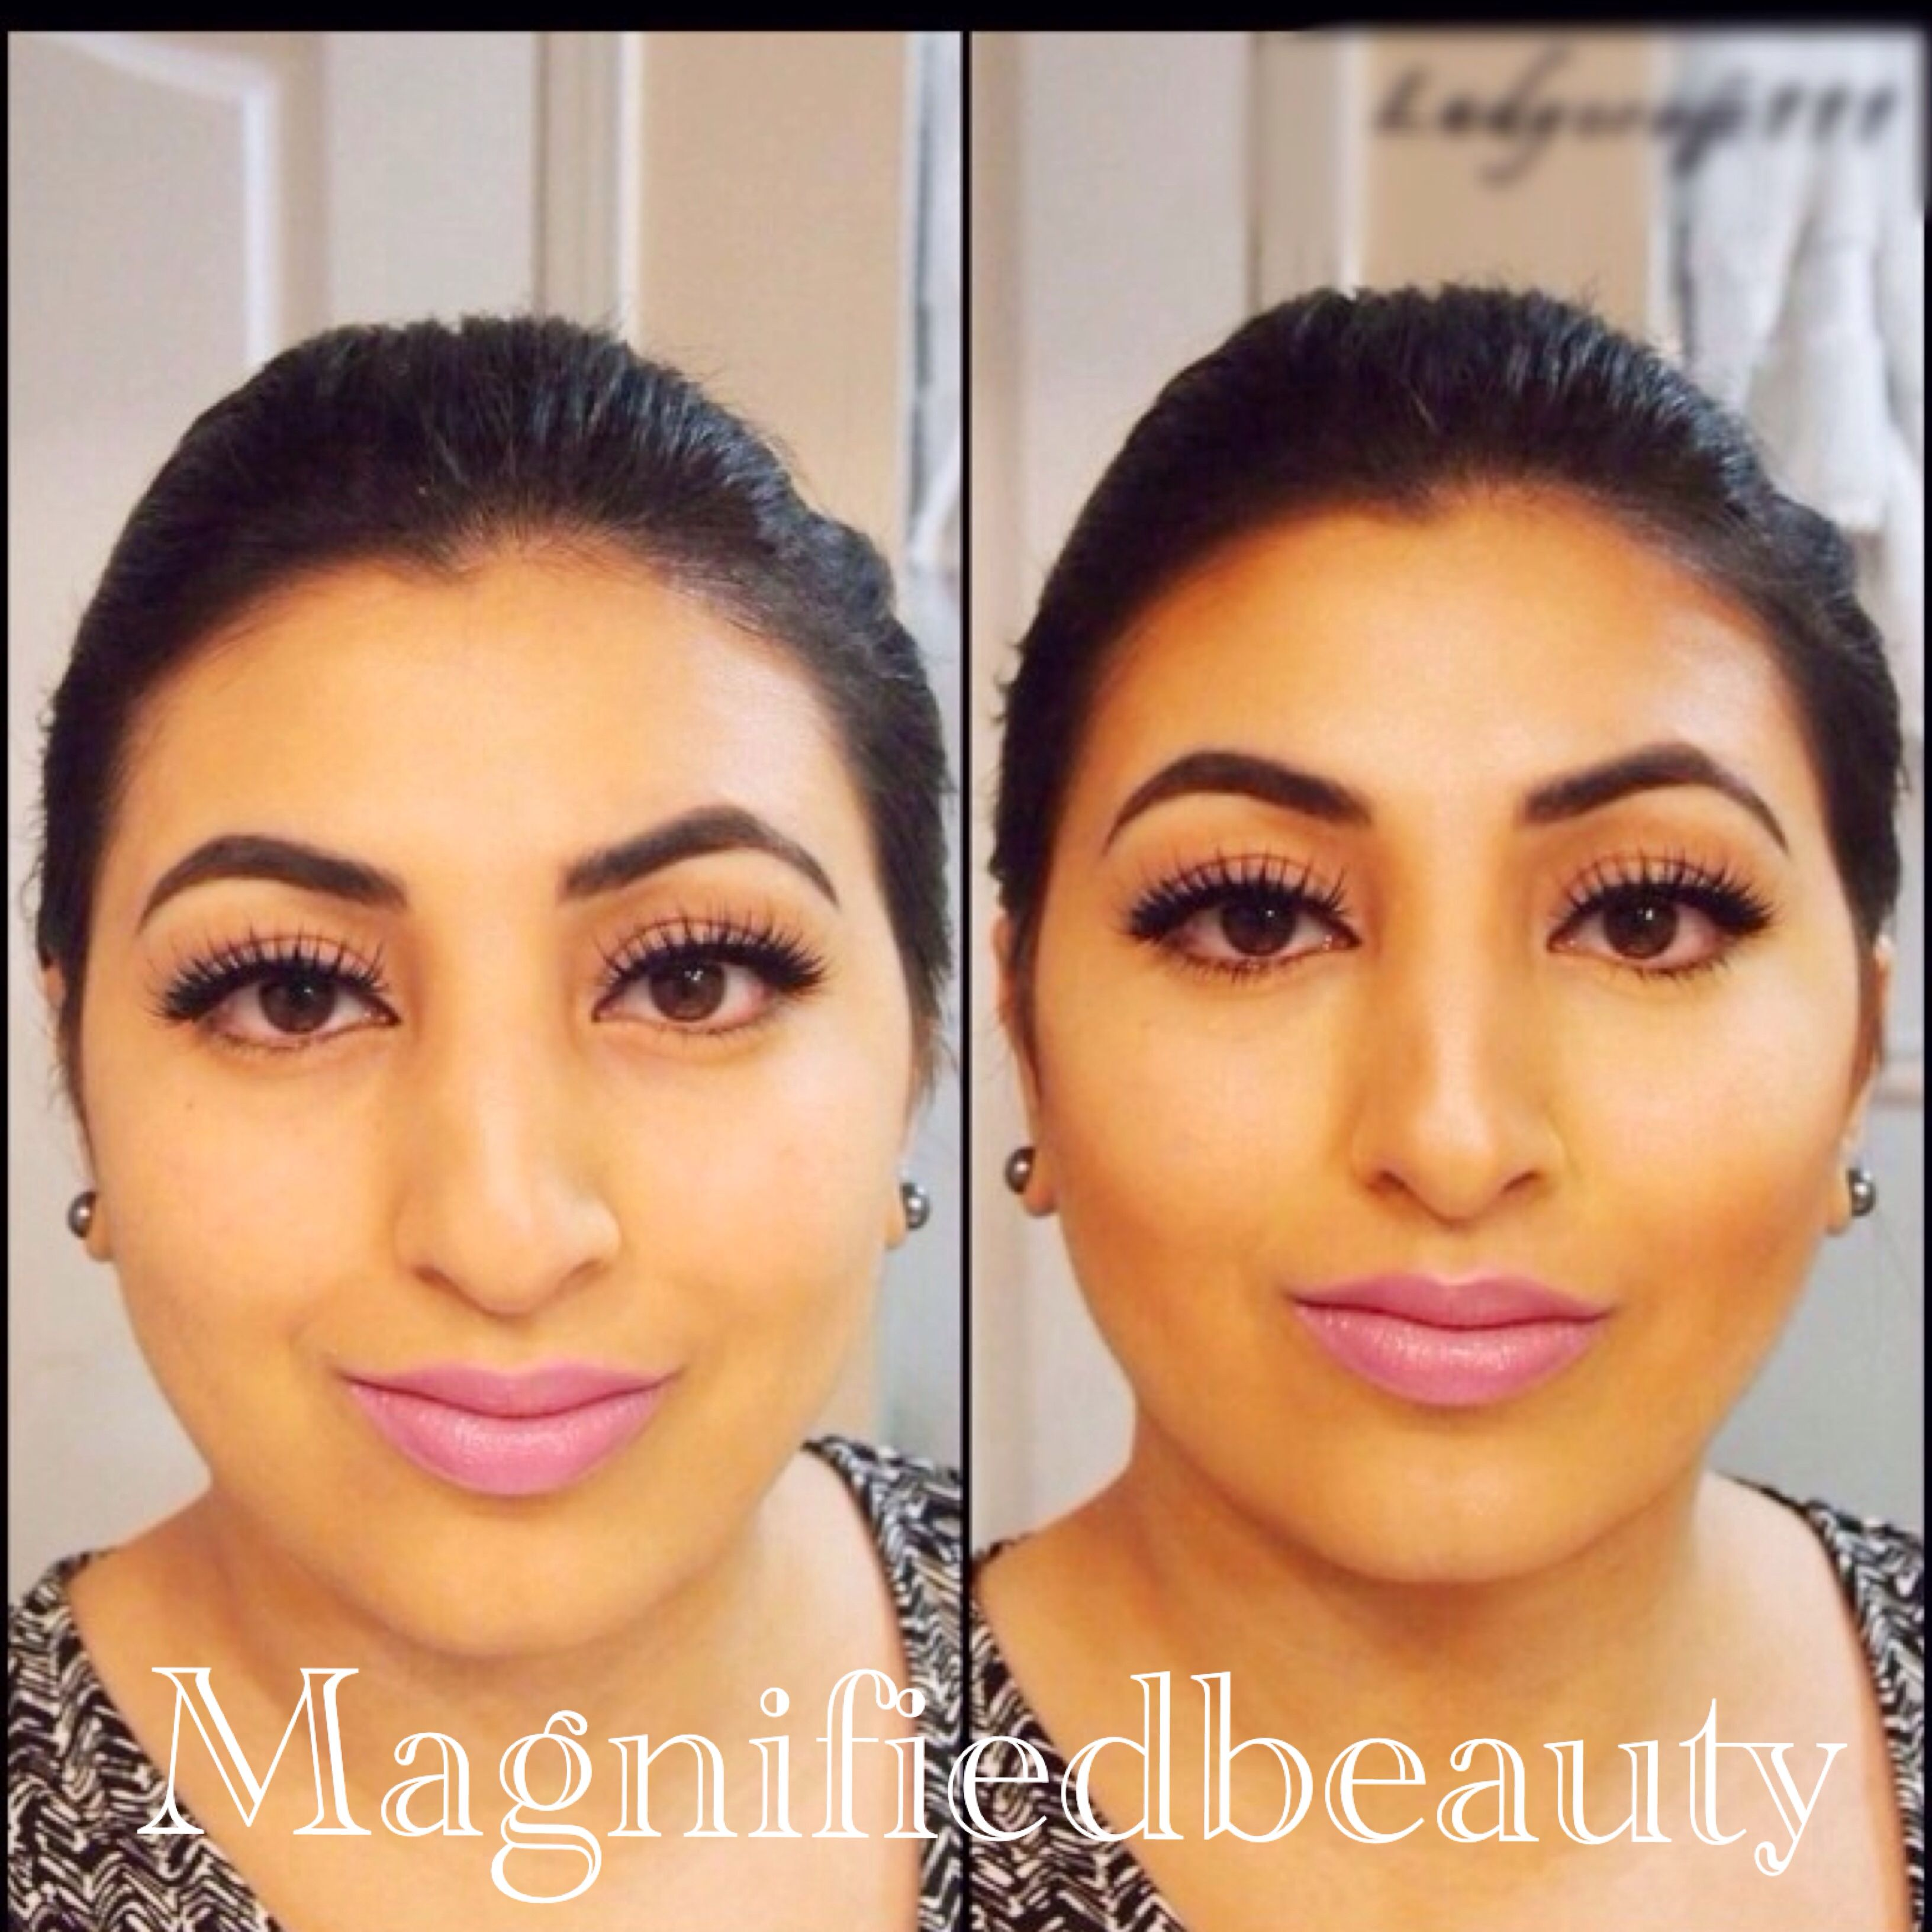 Anastasia contour kit-transformation by @magnifiedbeauty on Instagram